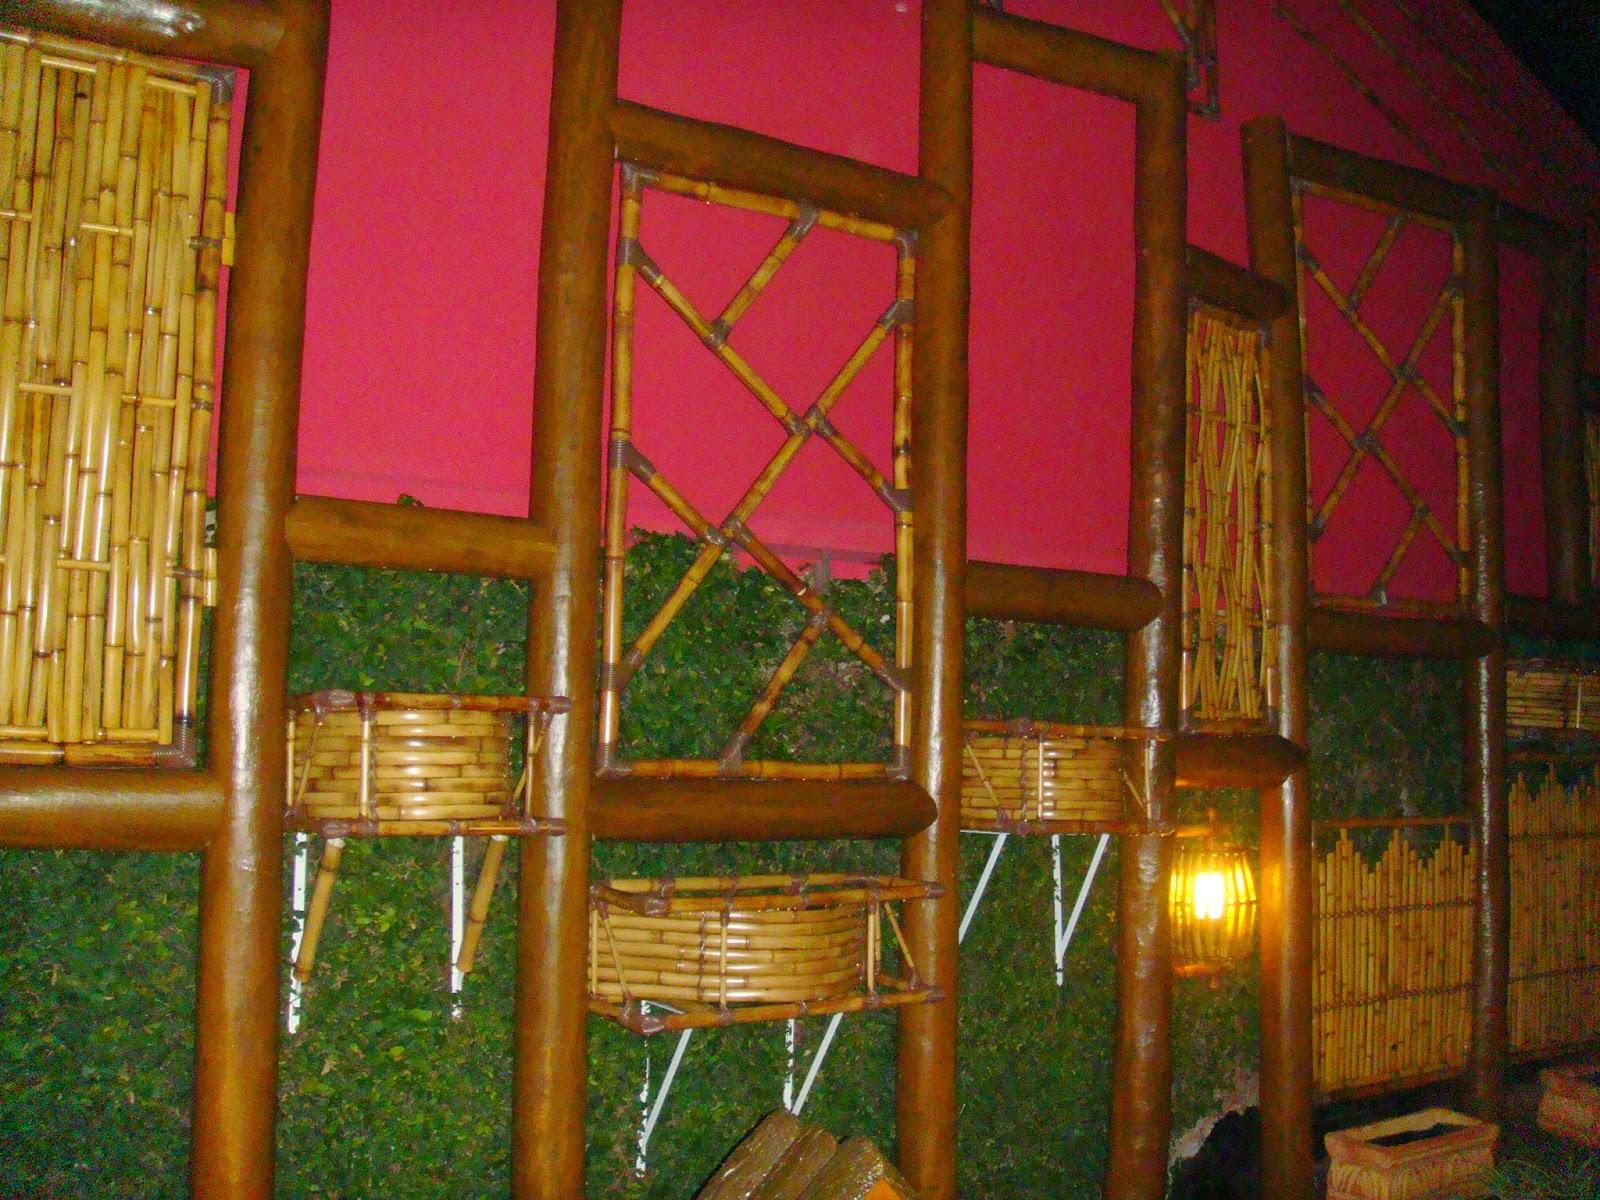 jardim vertical bambu:Arte em Bambu: Jardim Vertical em Bambu, visão noturna